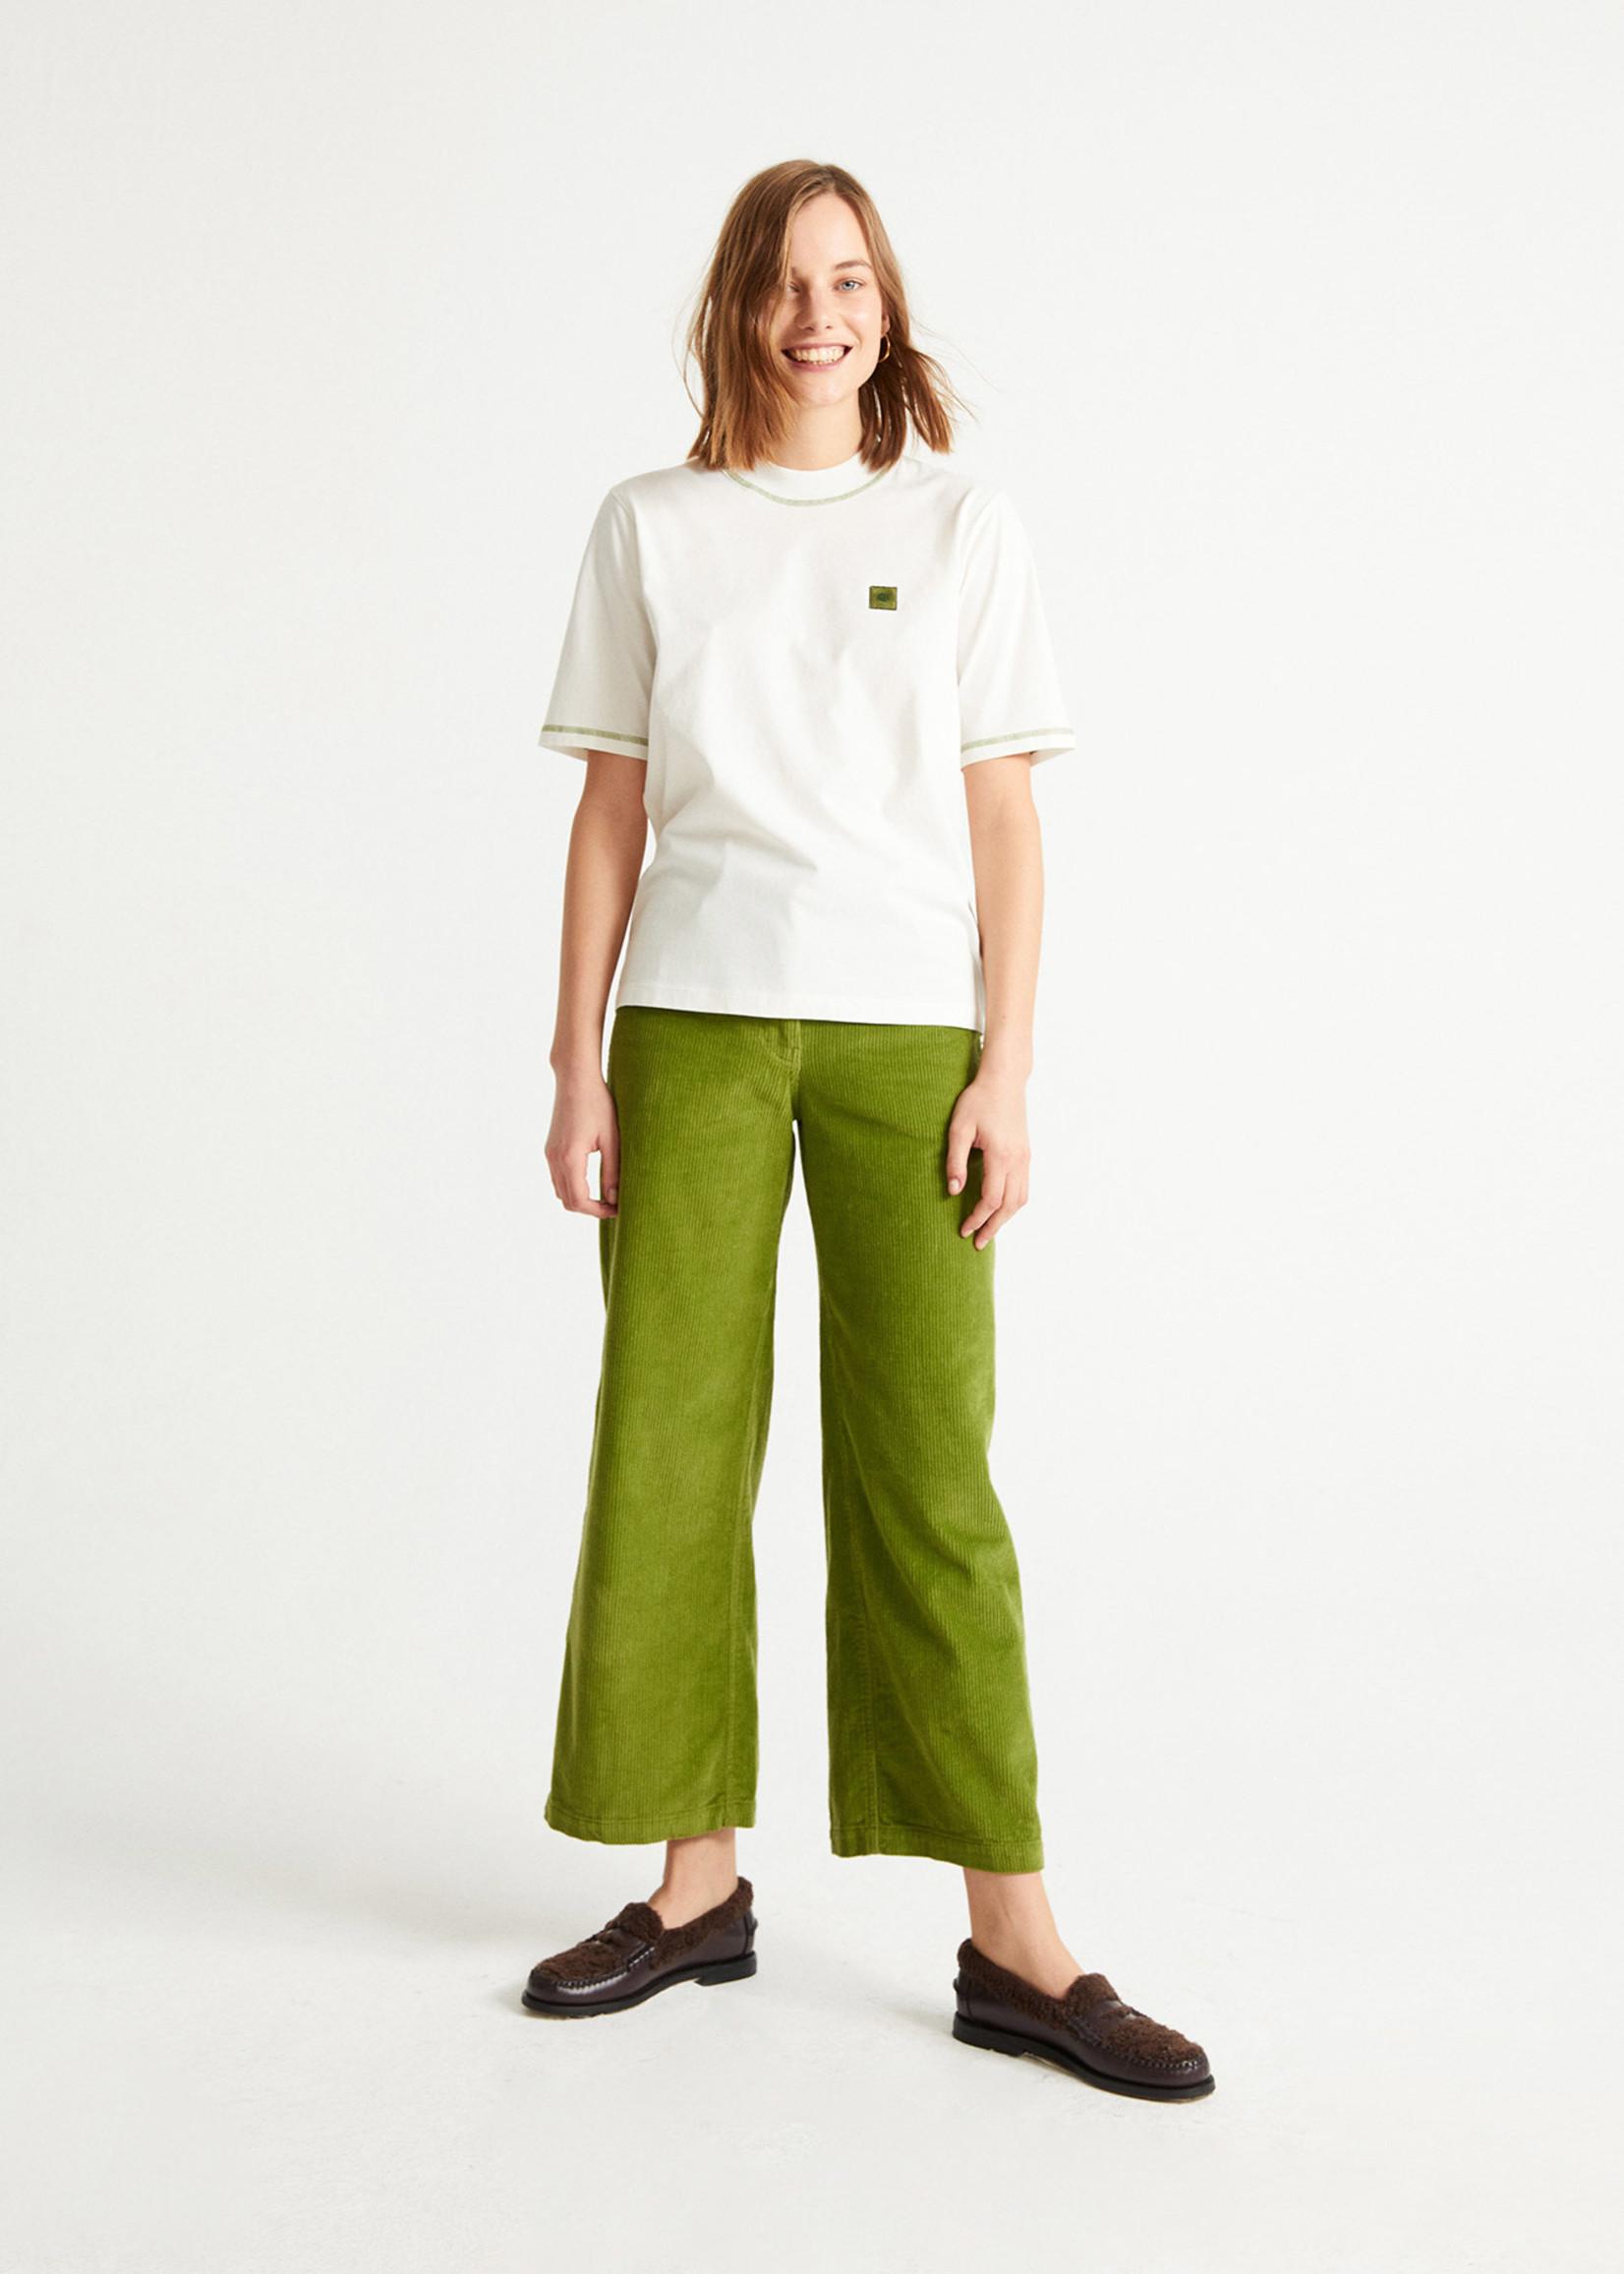 Thinking Mu Sol Green Contrast T-shirt